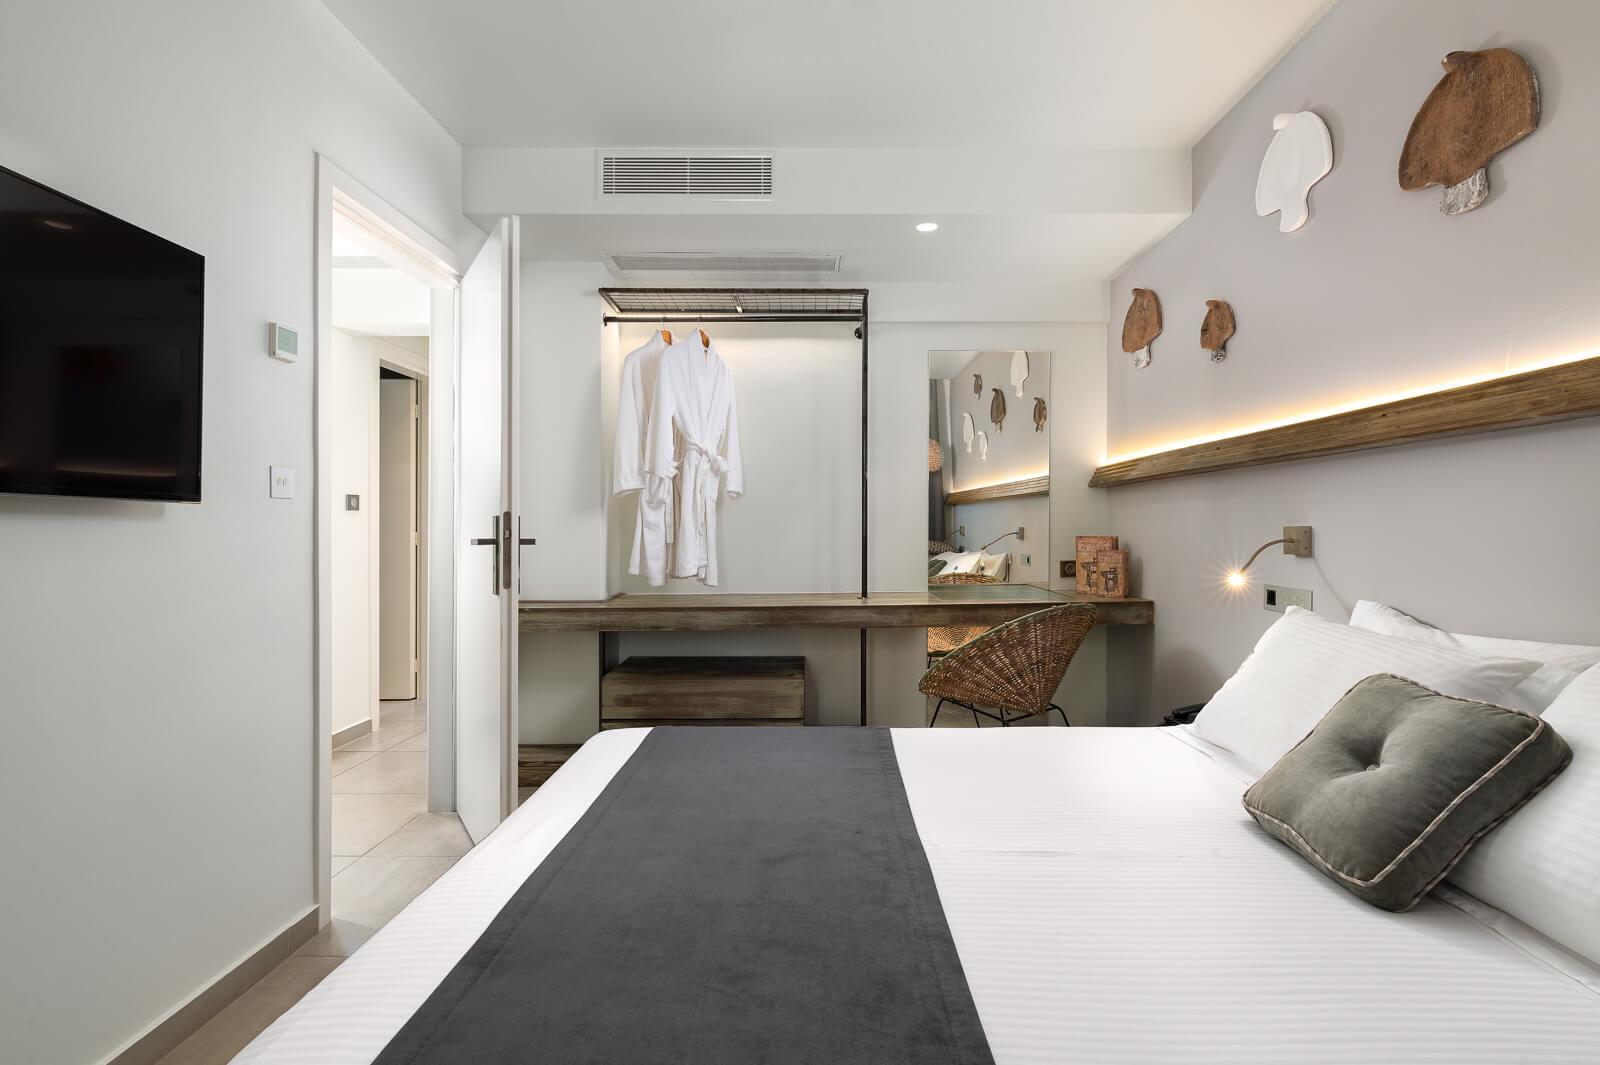 Nisos Hotel Room - Elakati Hotel in Rhodes